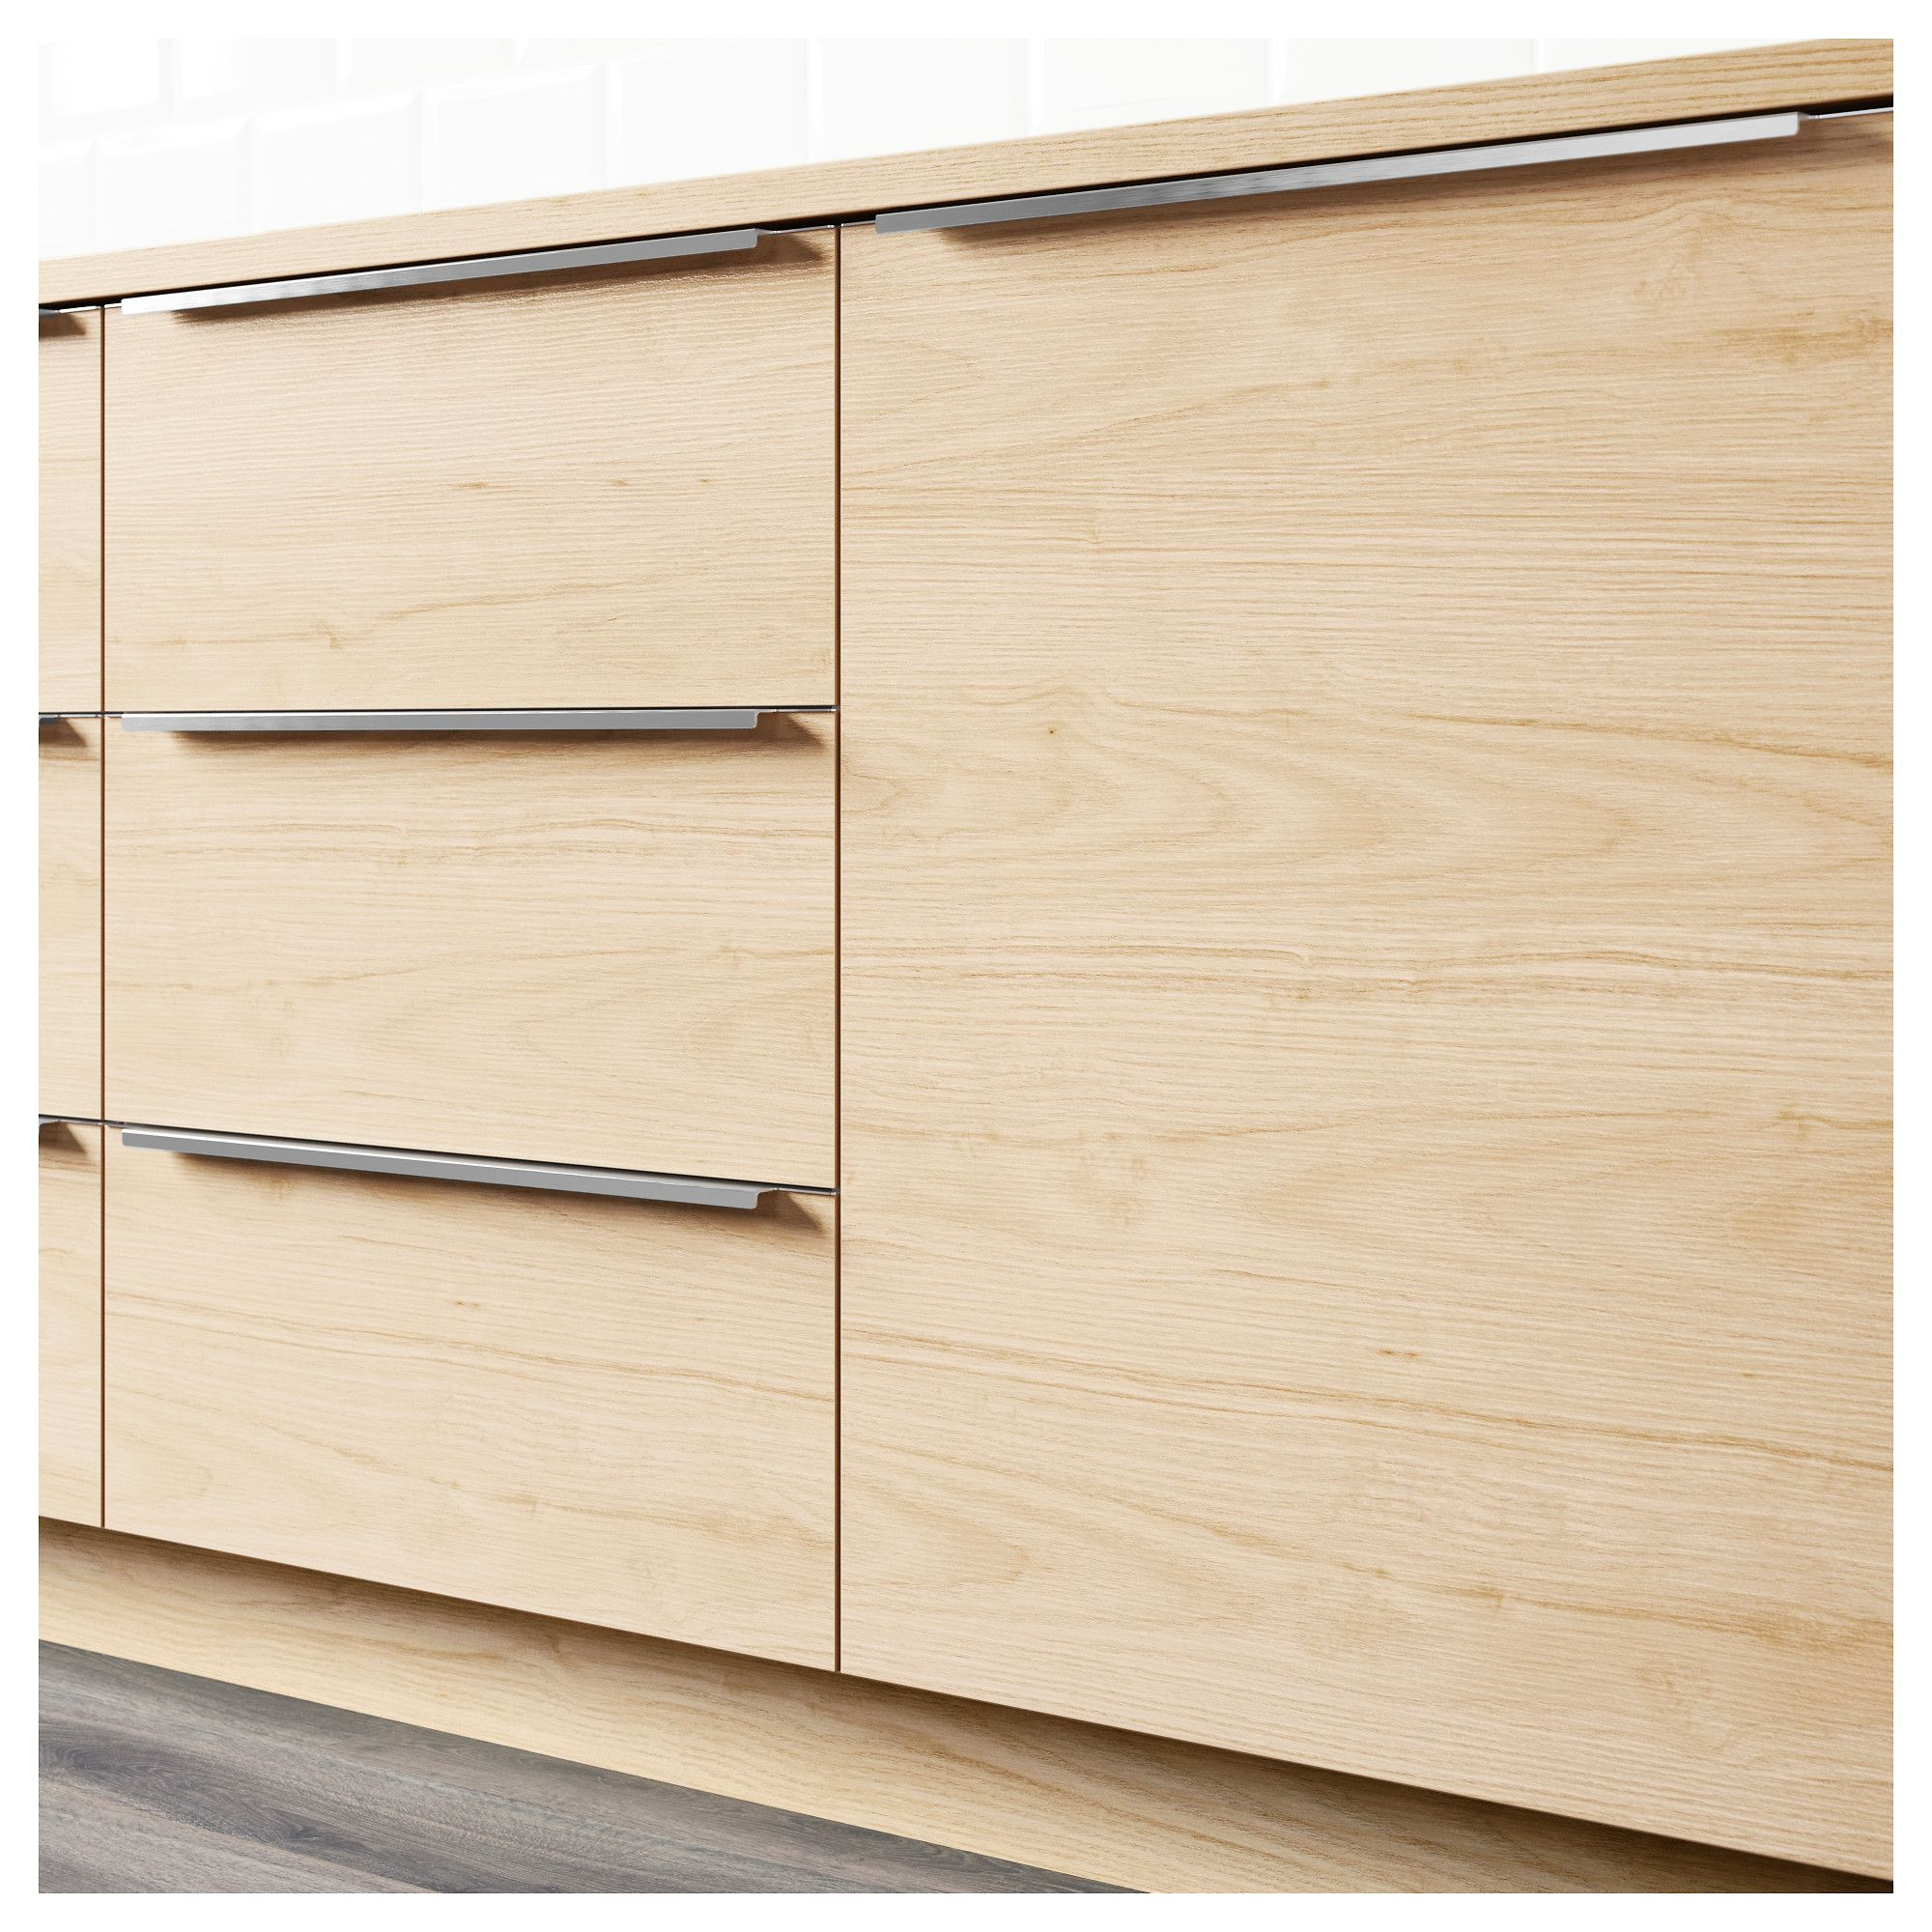 Ash Grey Cabinets Kitchen: IKEA - ASKERSUND Drawer Front Light Ash Effect